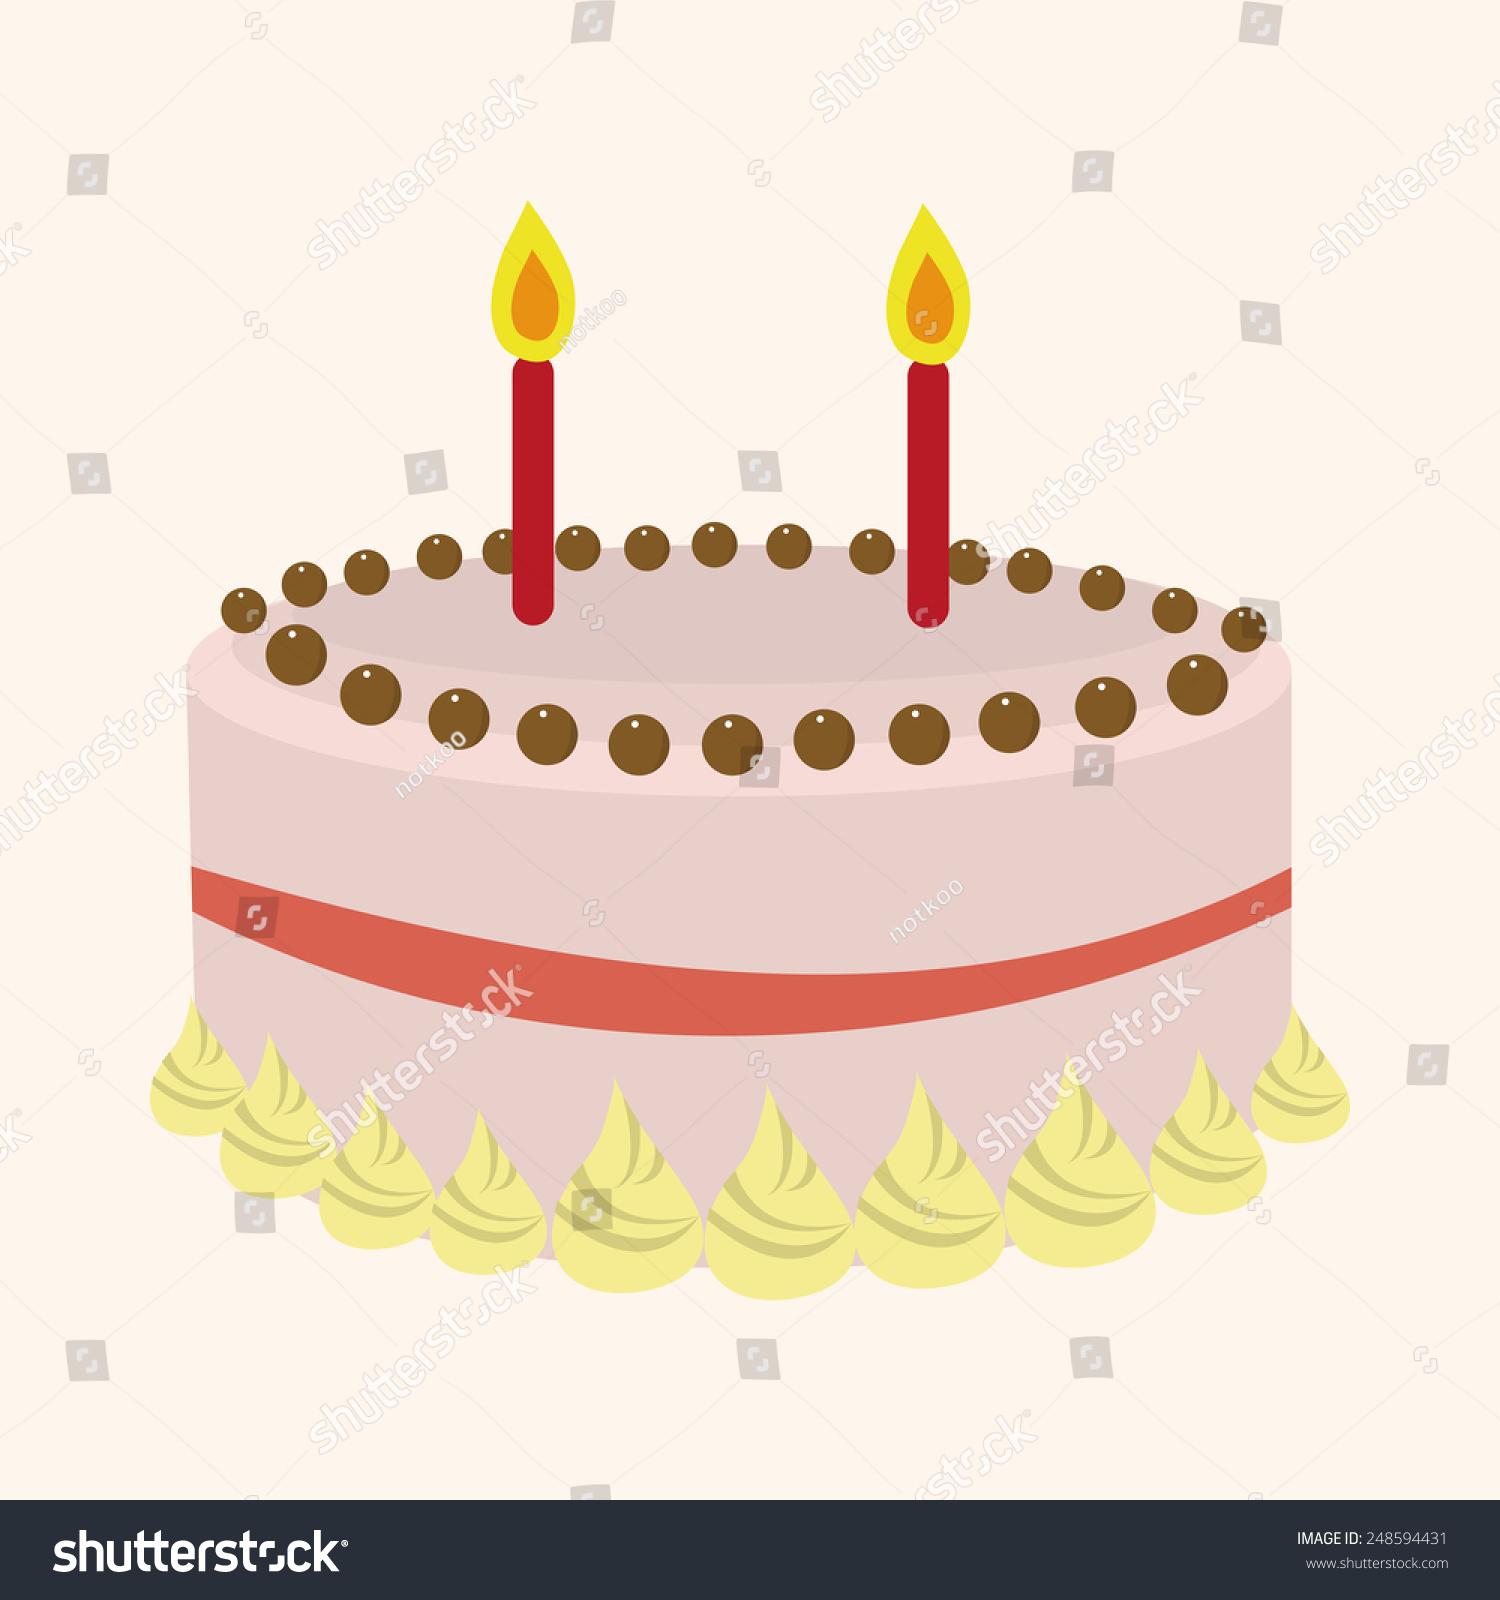 Cake Decoration Cartoon : Cartoon Decorating Cake Stock Photo 248594431 : Shutterstock